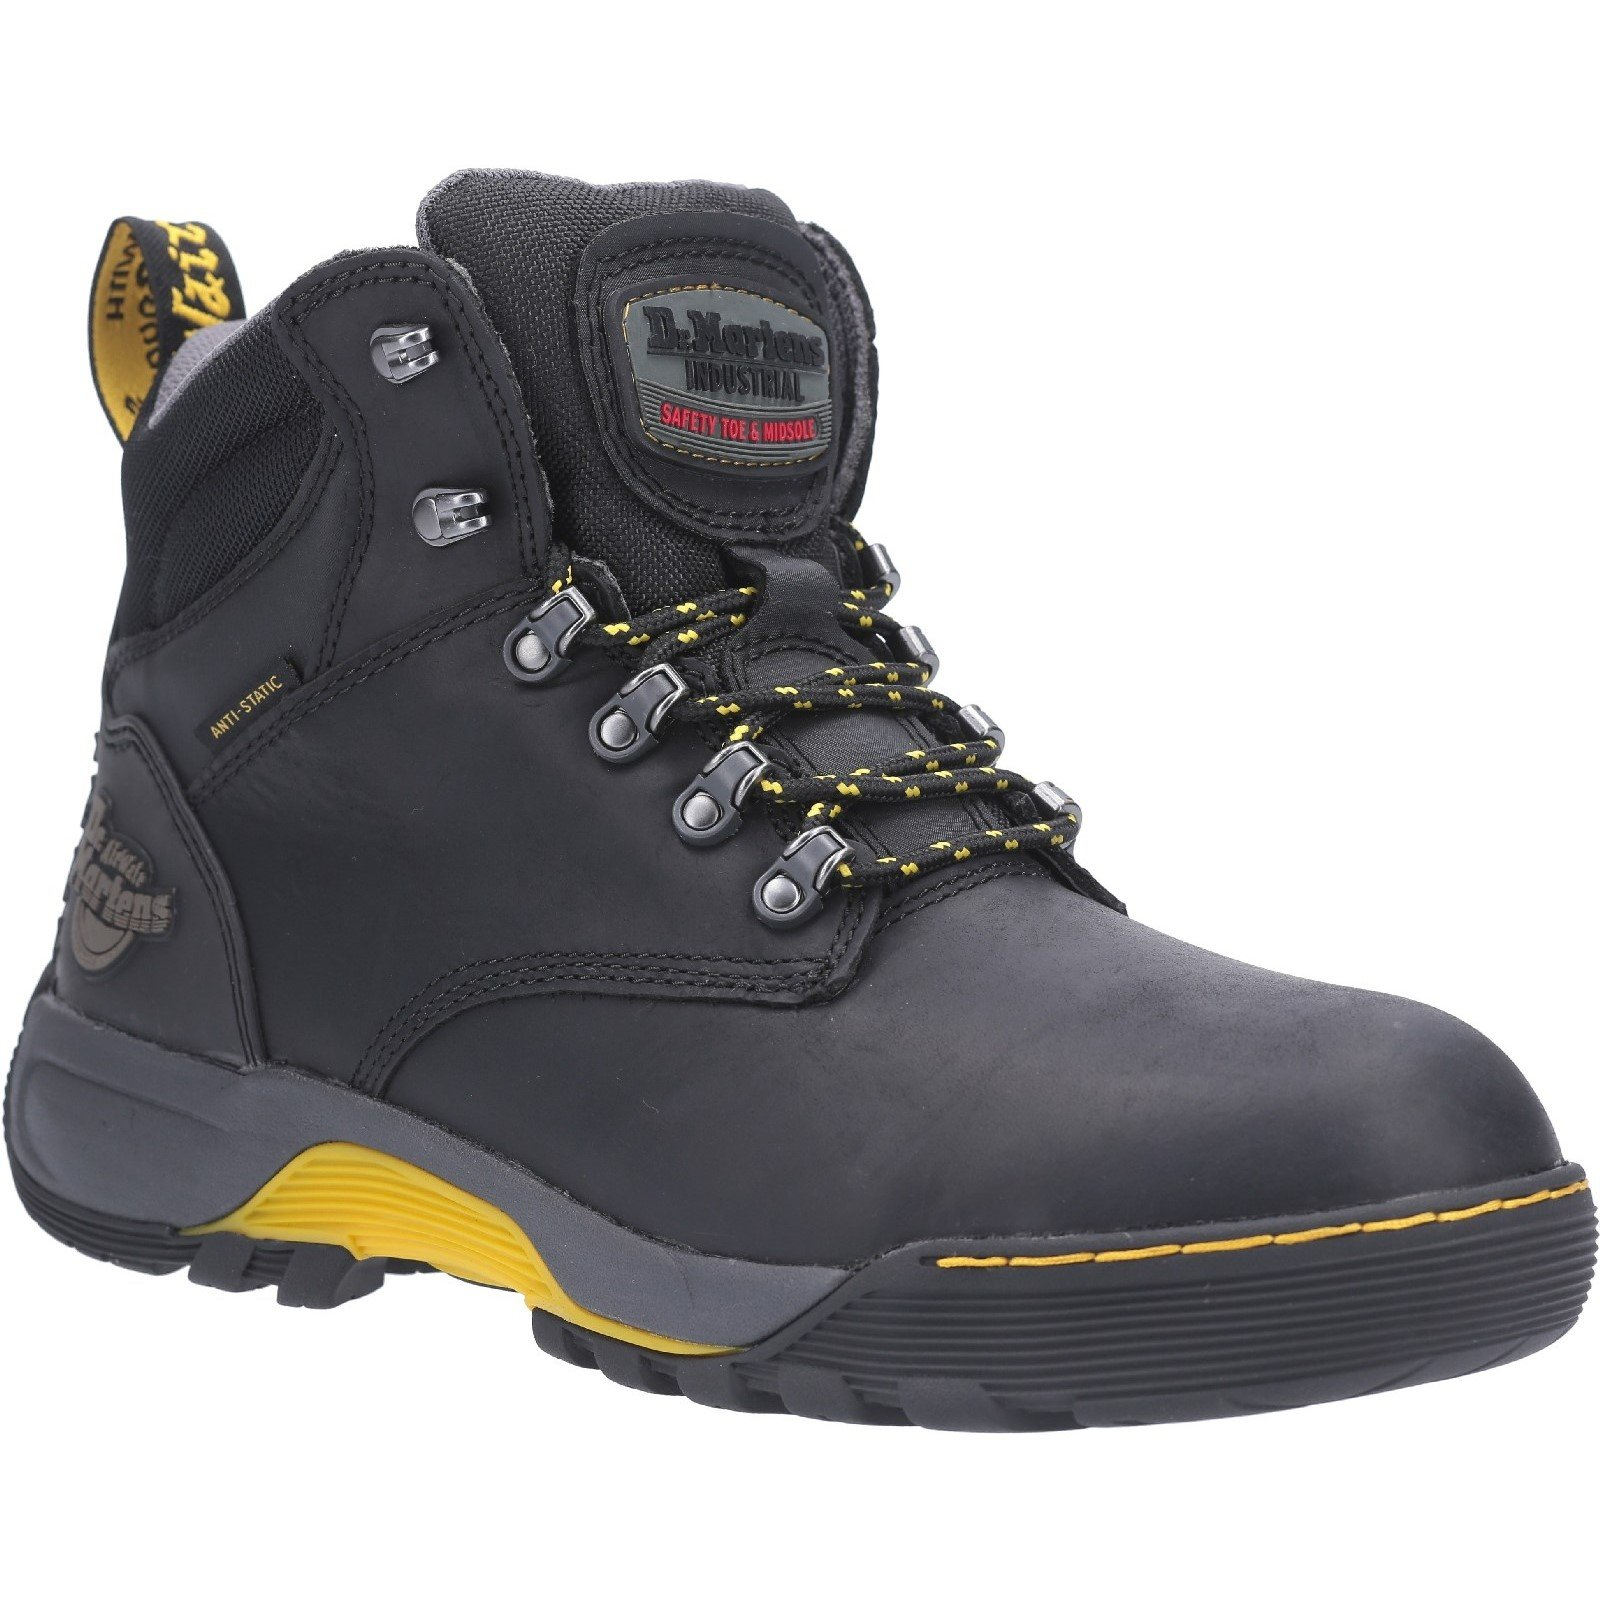 Dr Martens Unisex Ridge ST Lace Up Hiker Safety Boot Black 28324 - Black 7